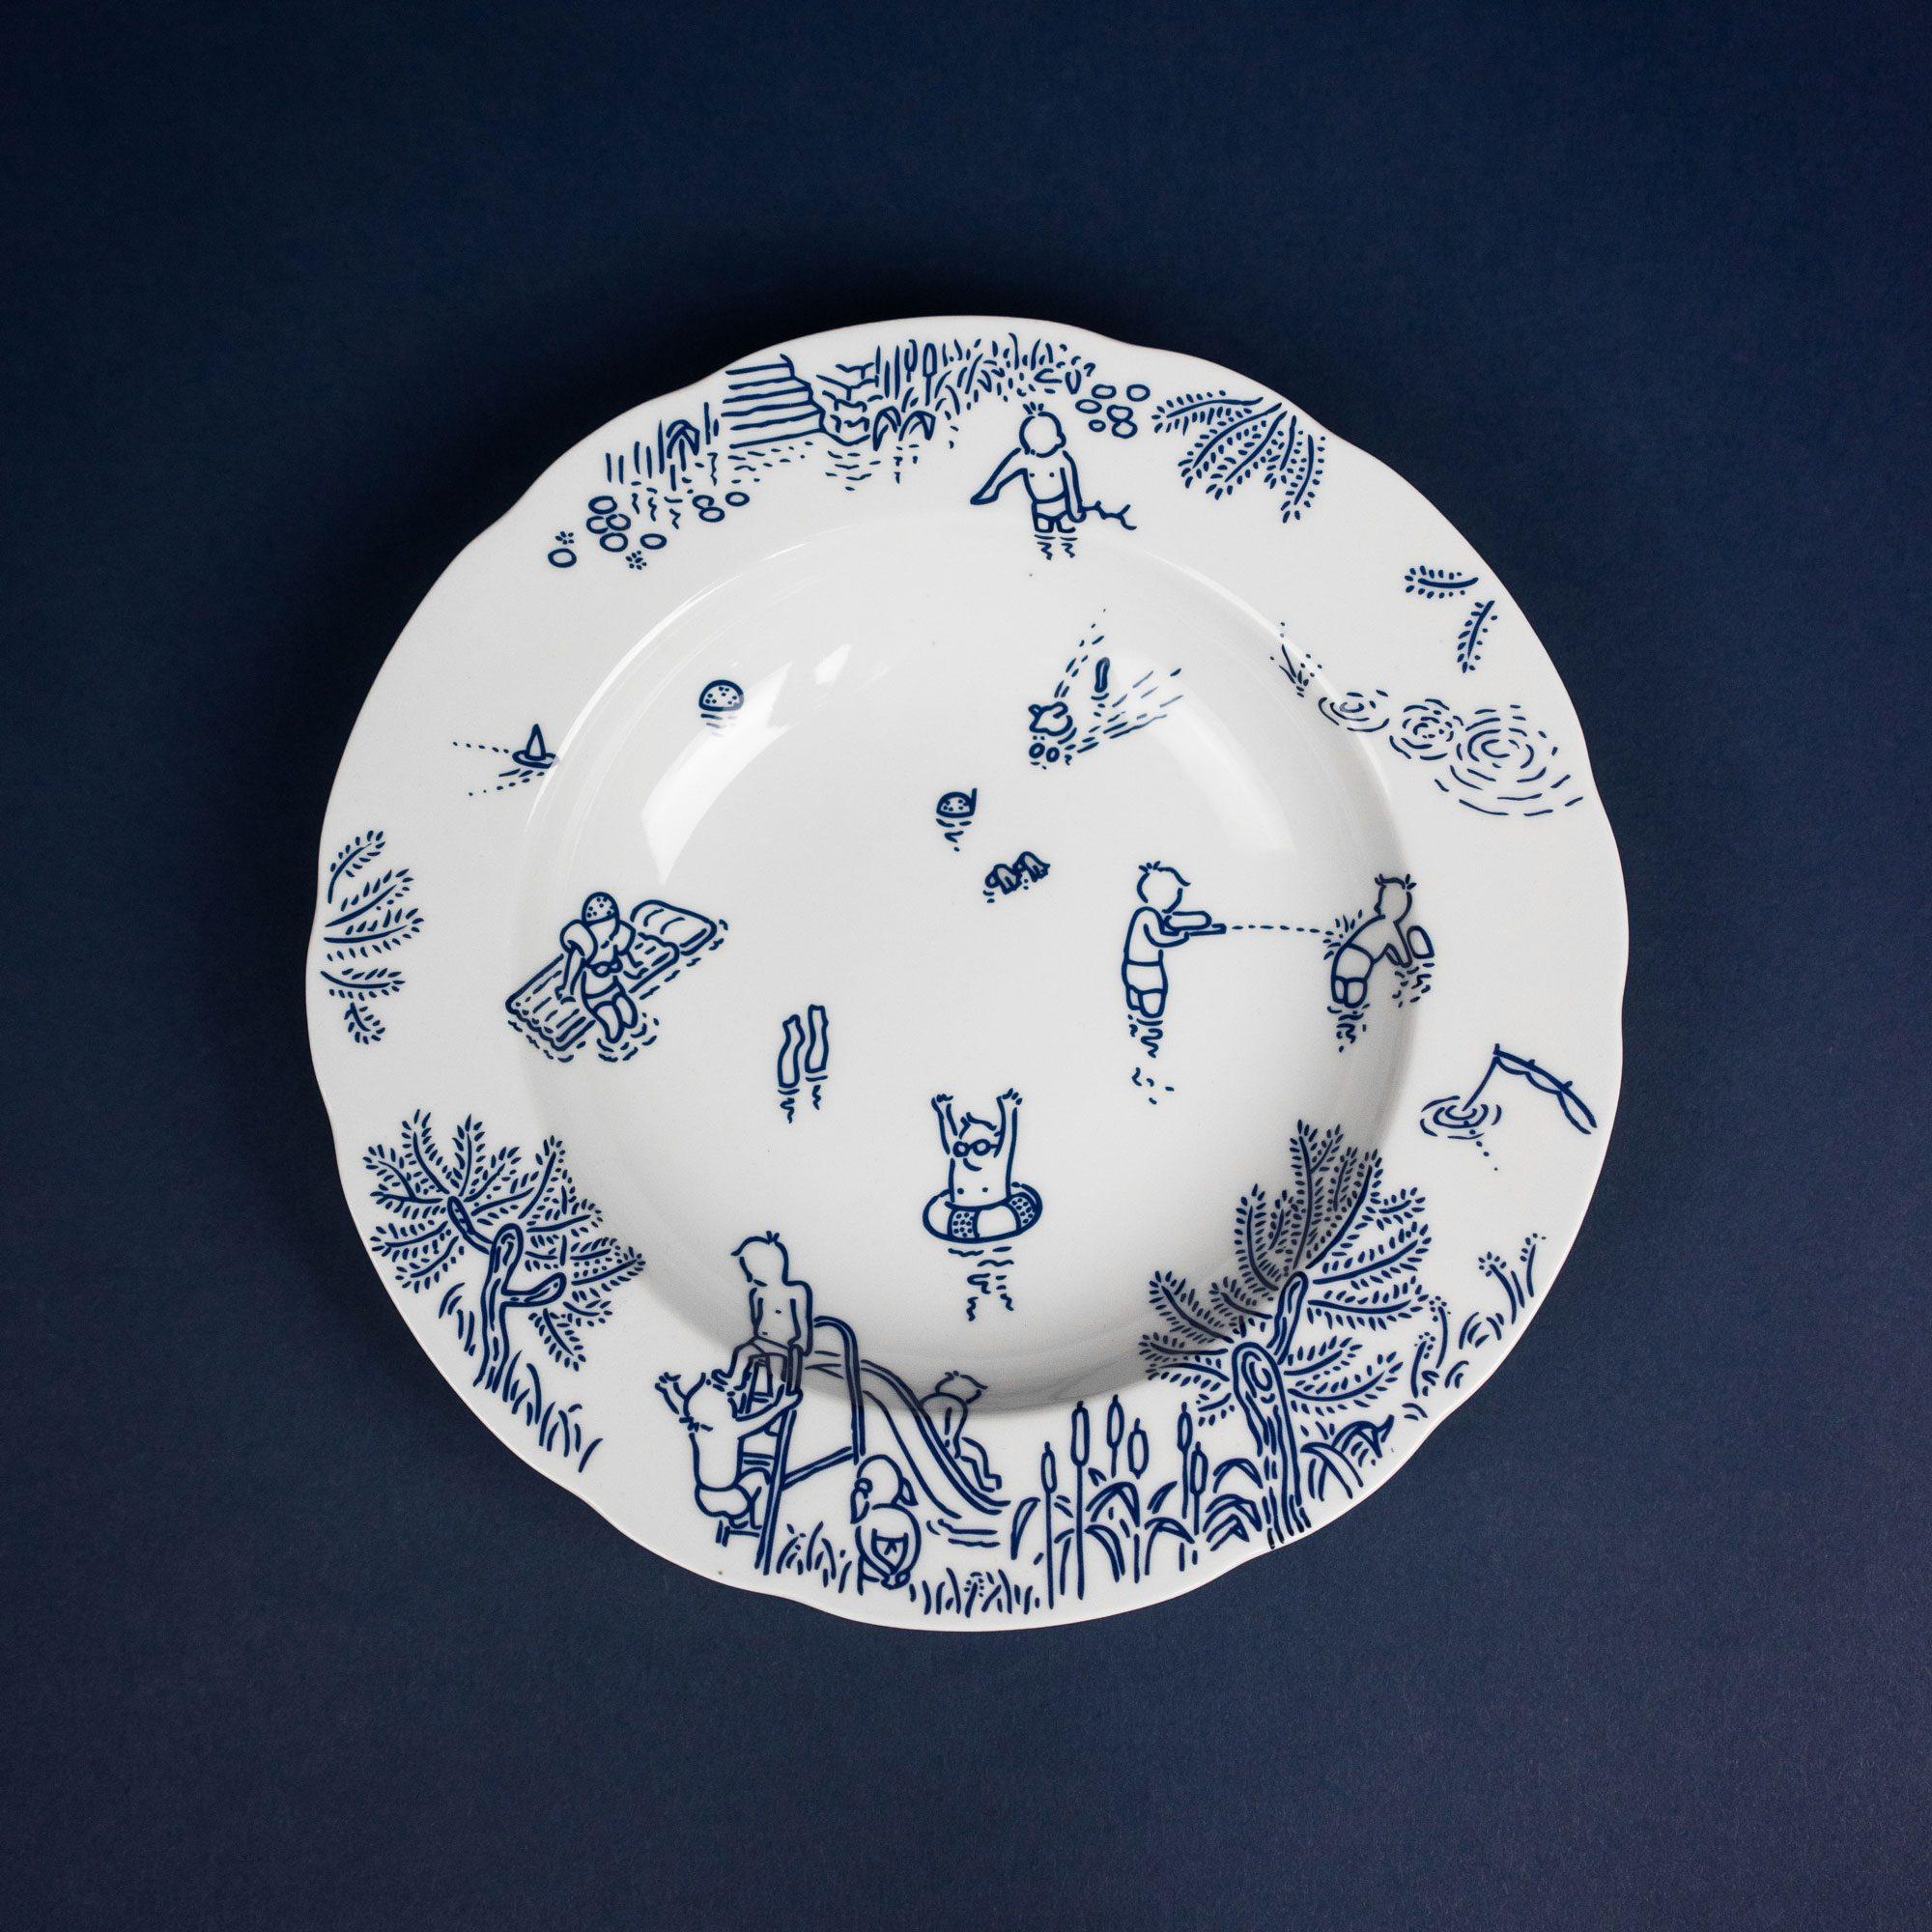 Blue porcelain soup plate by Michal Bacak for Krehky design studio